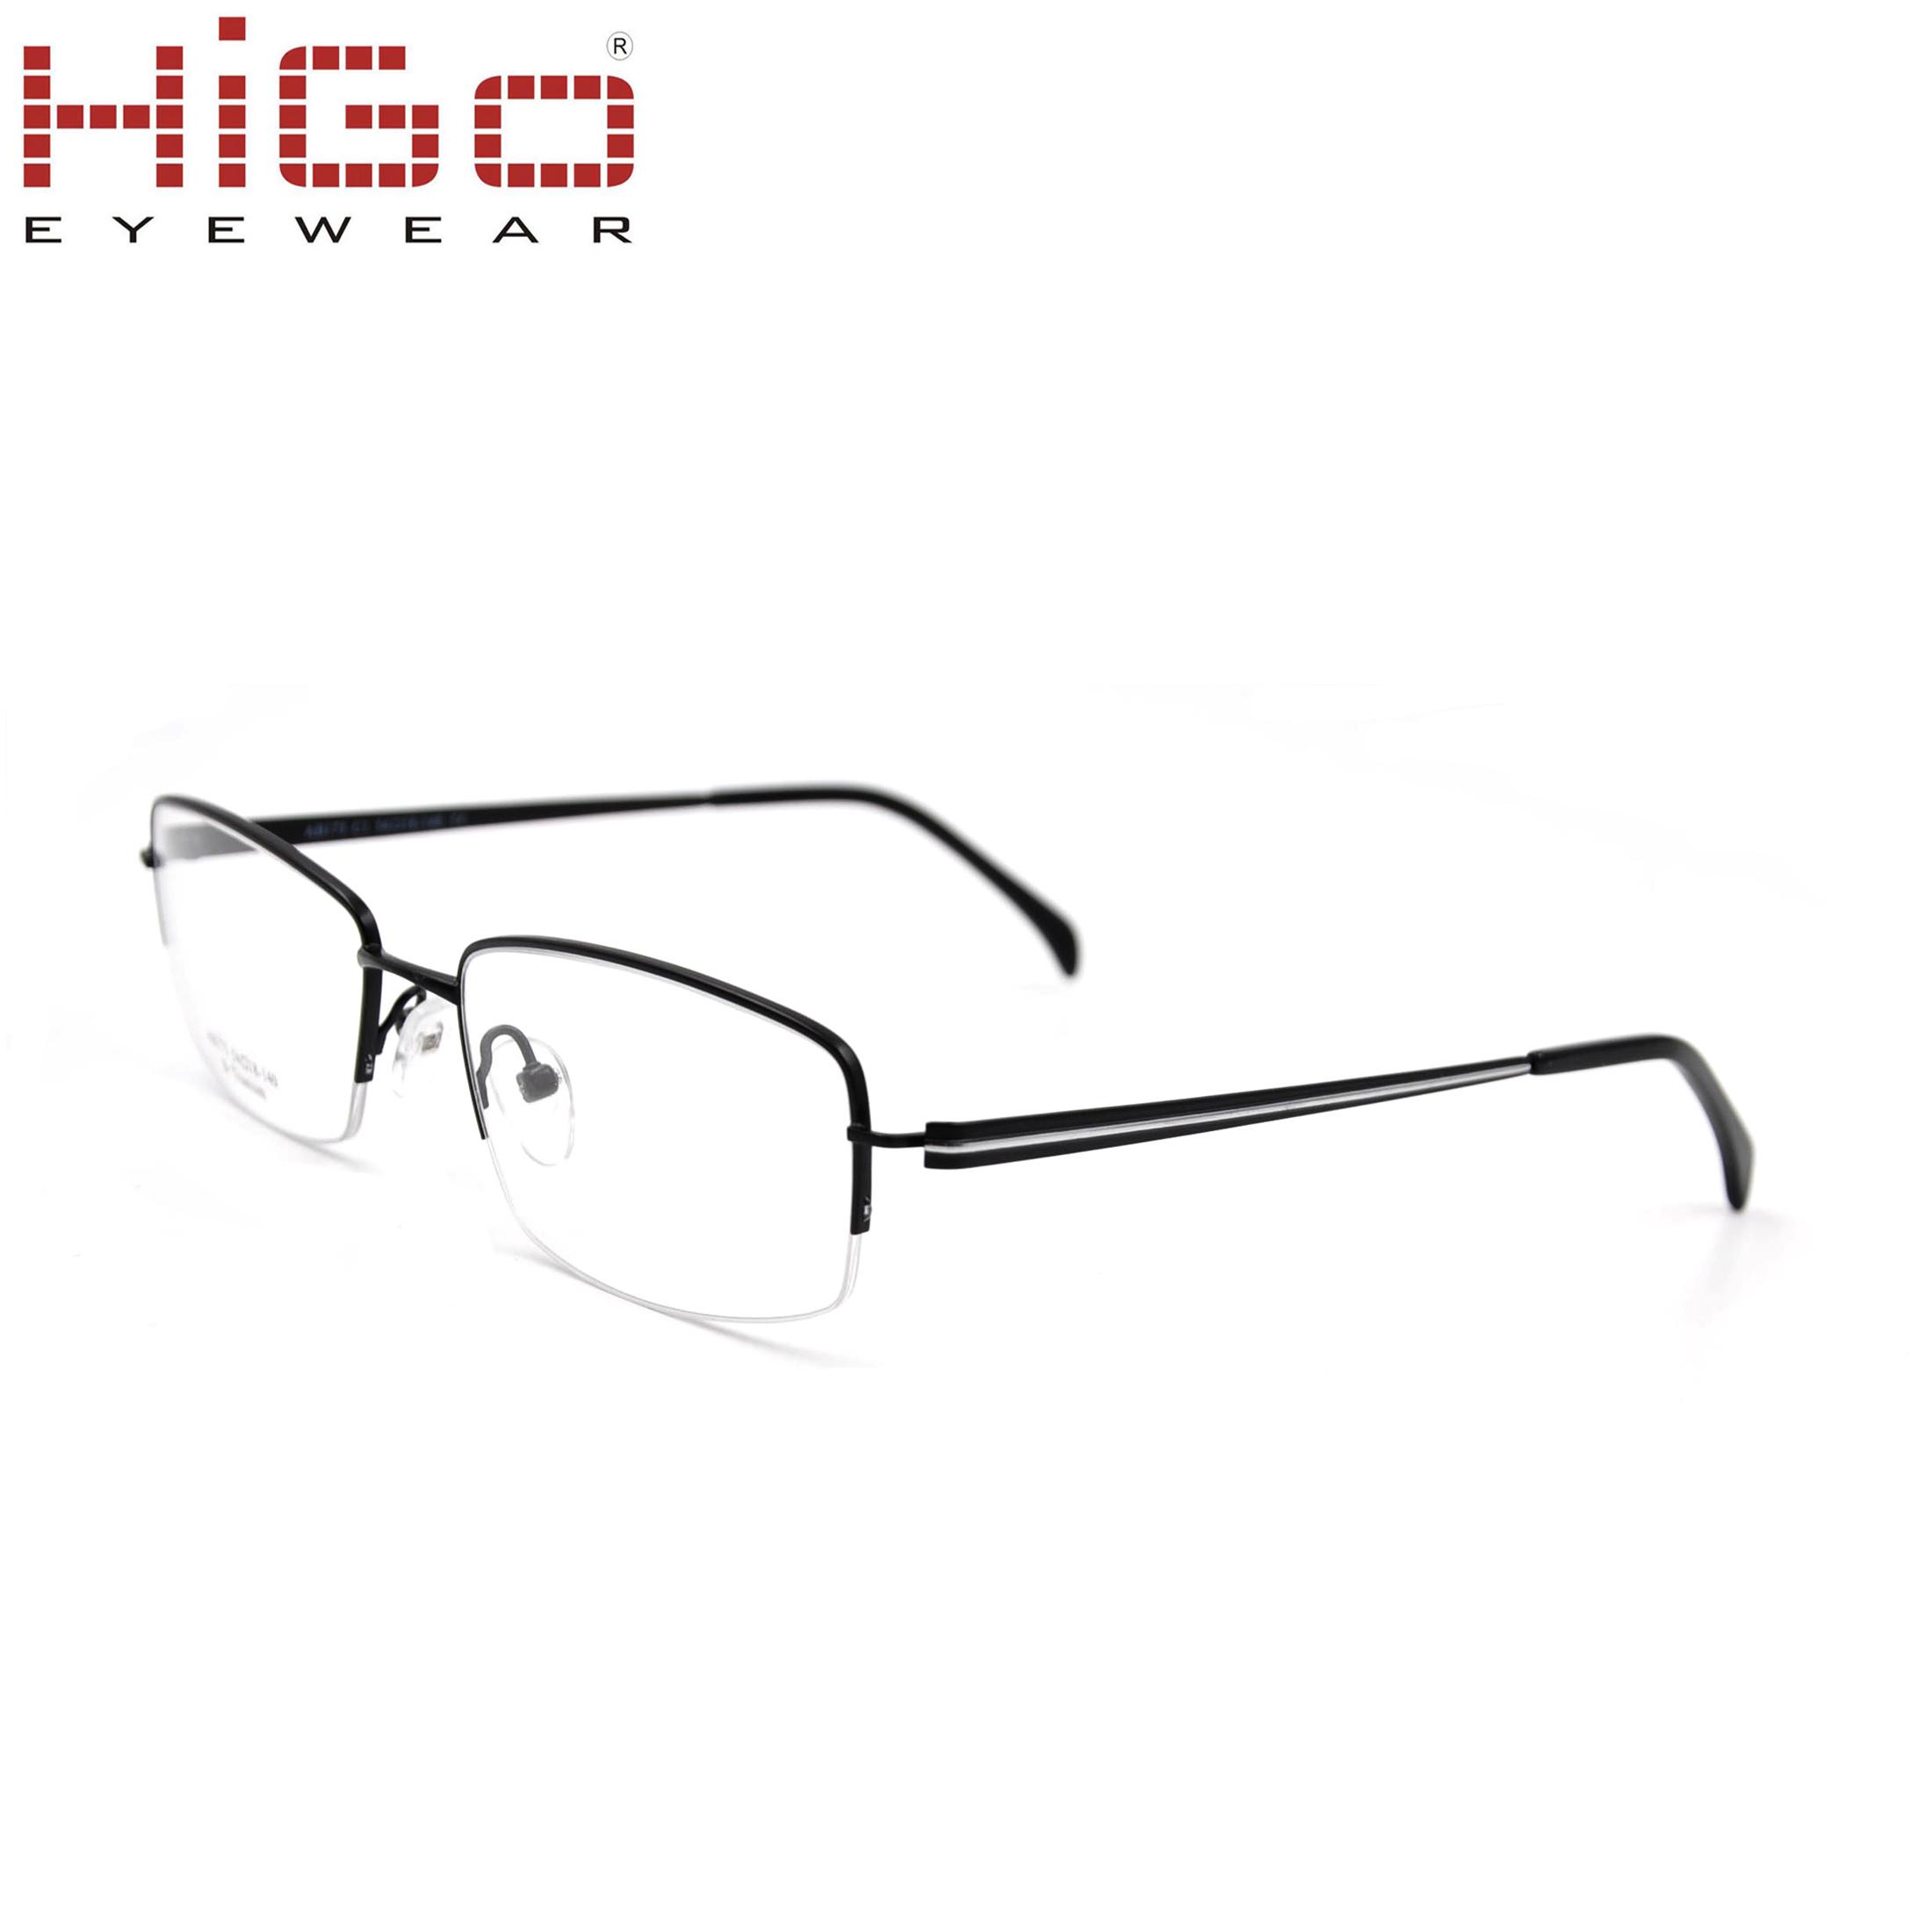 aef21a59f0 China Trending China New Model Half Rim Titanium Eyeglasses Frame ...